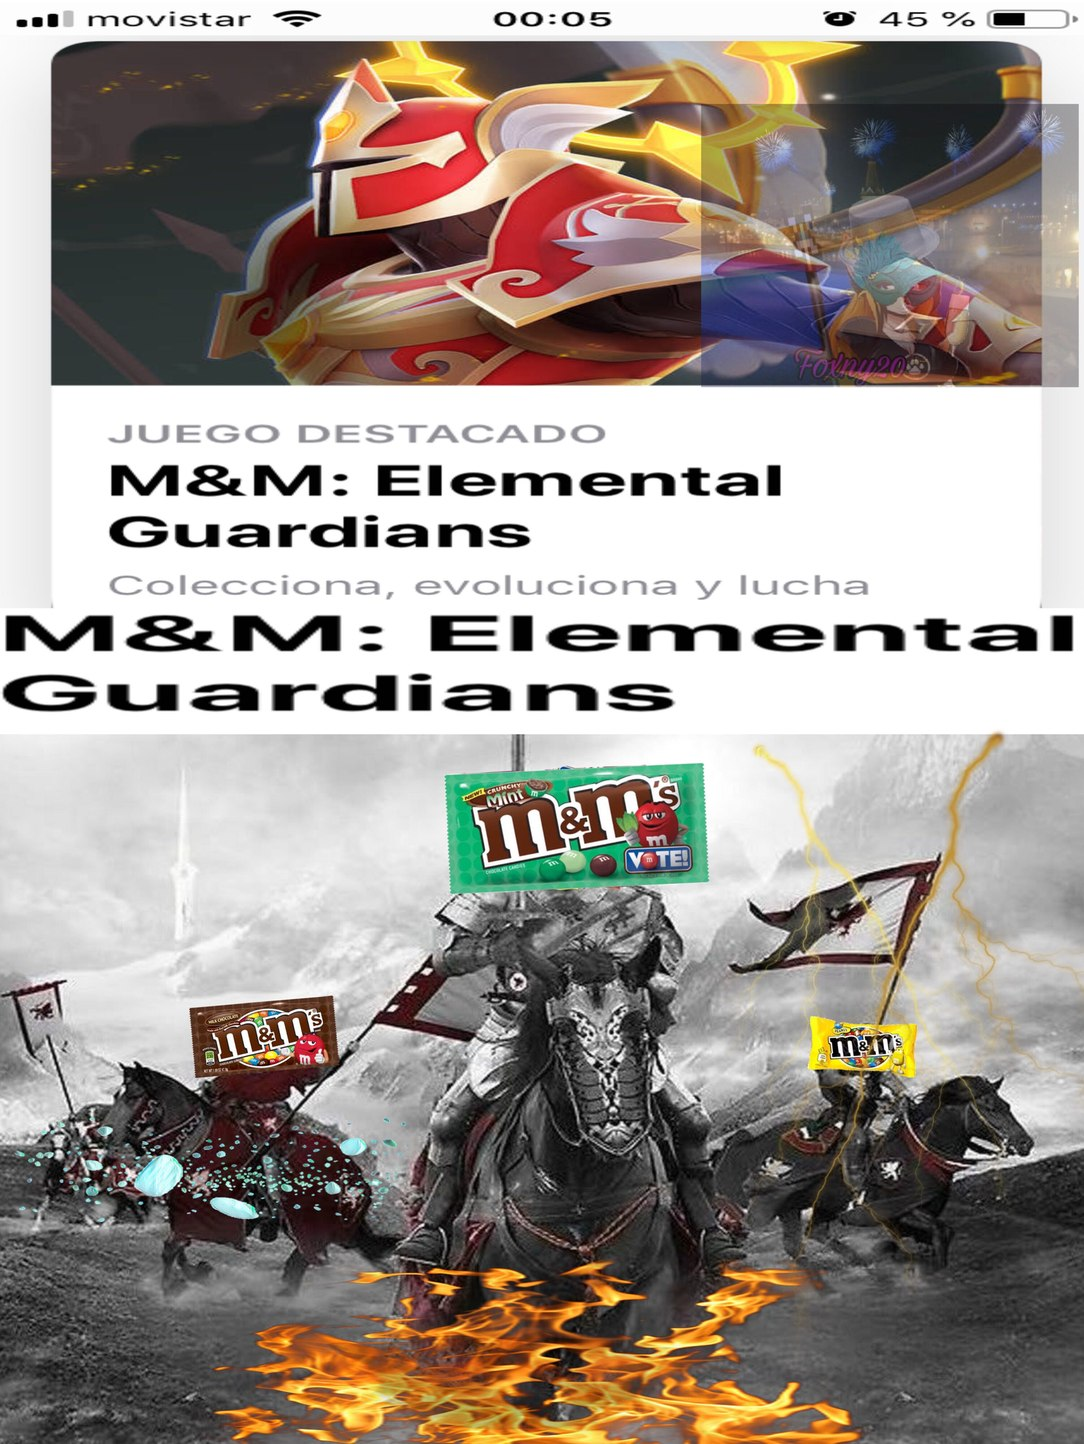 caramelos de chocolate elementales guardianes - meme